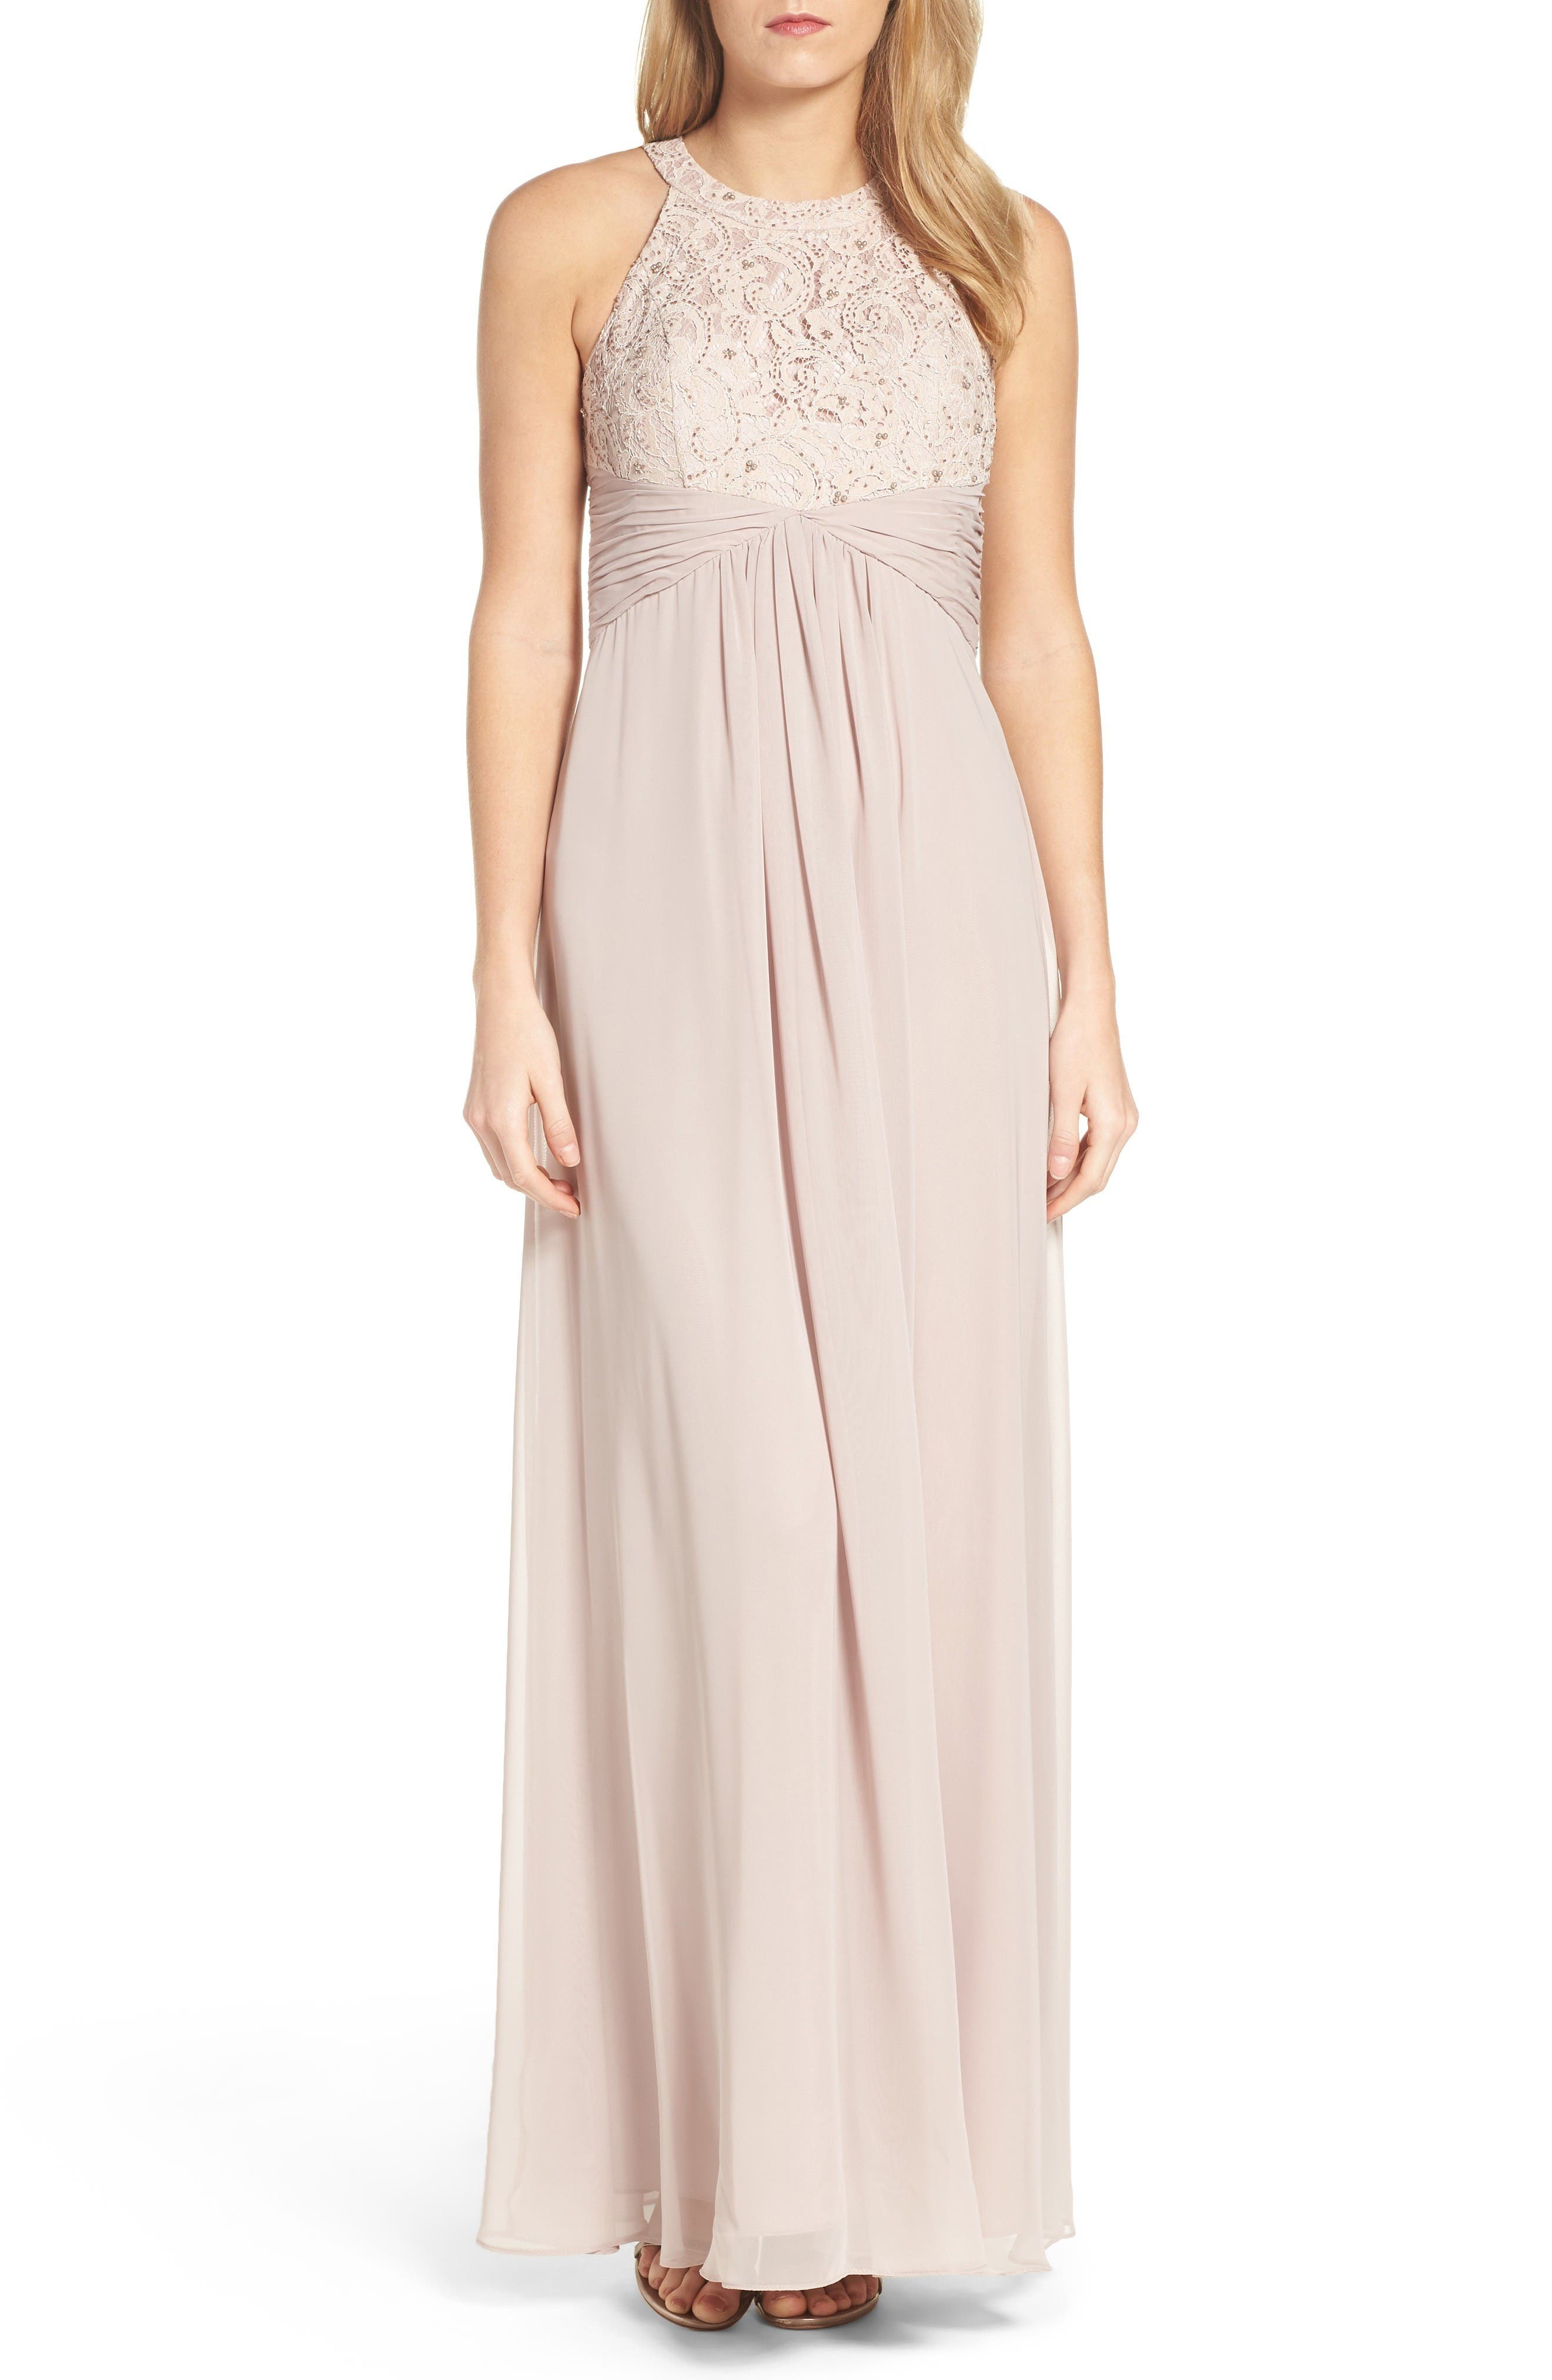 Eliza J Beaded Lace & Chiffon Gown